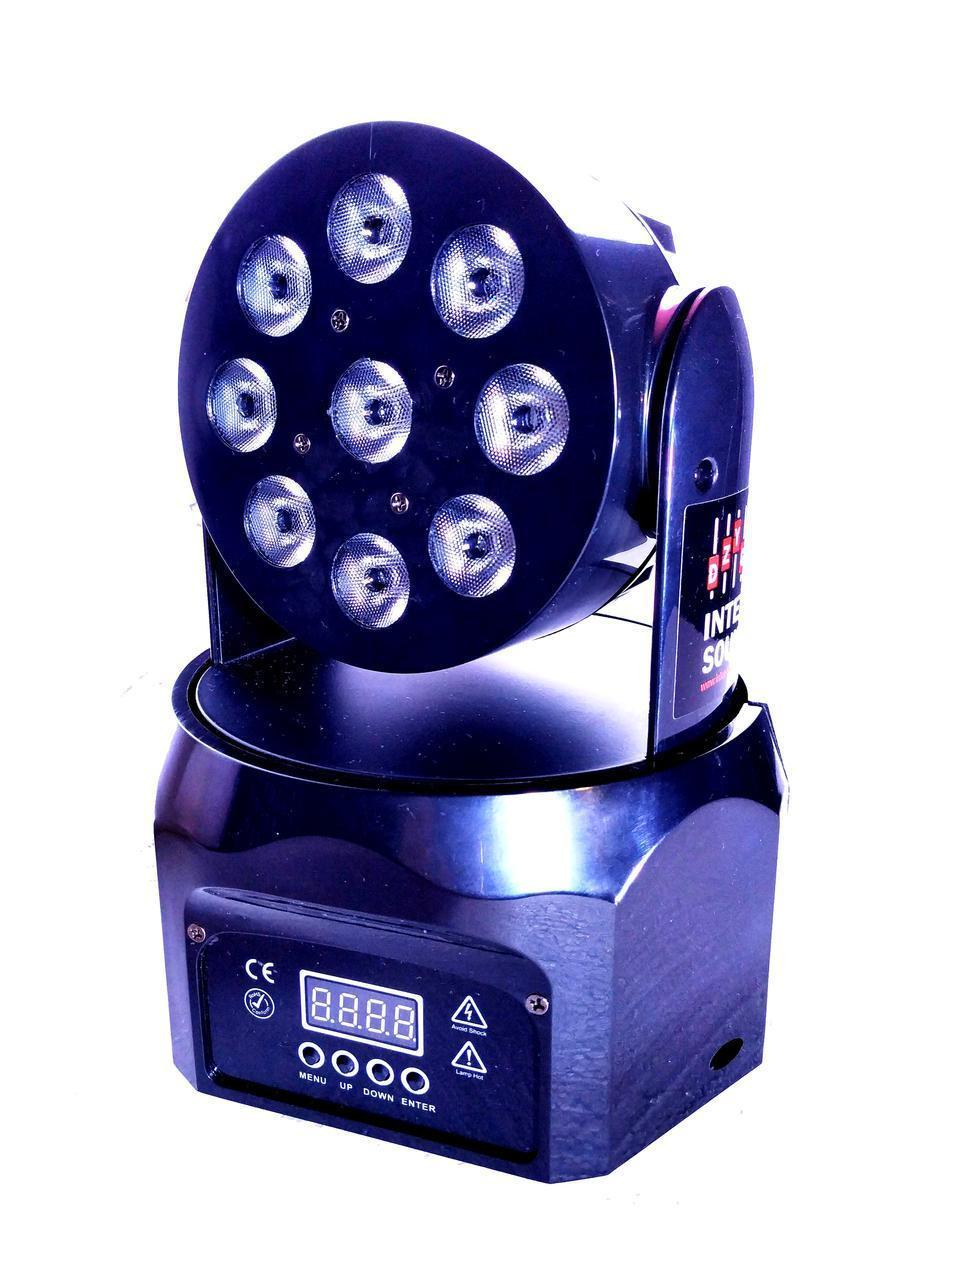 Динамический световой прибор голова Moving head Wash 9x8w RGBW 4in1 DMX